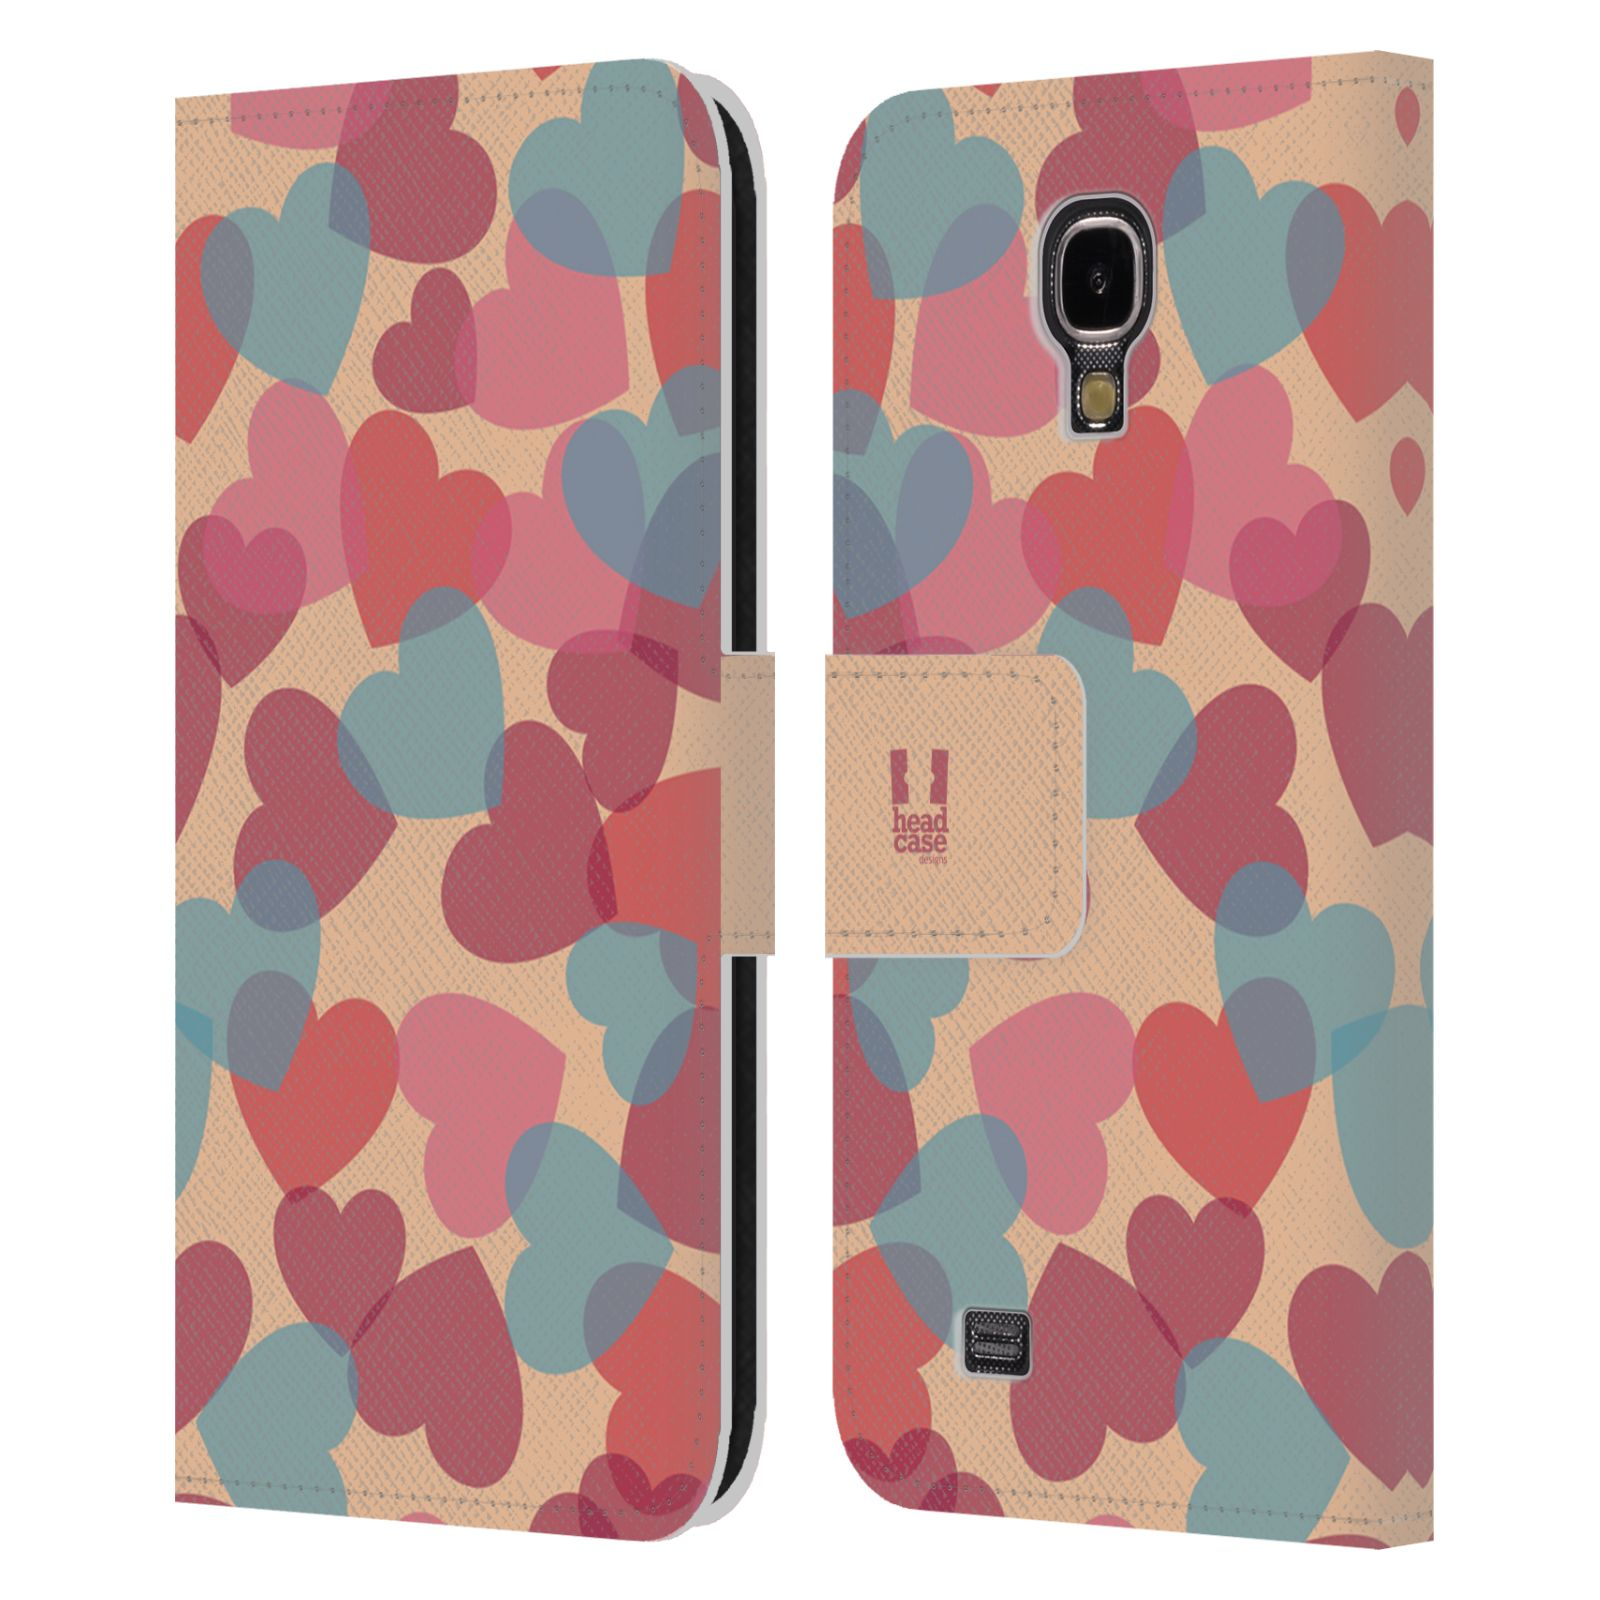 HEAD CASE Flipové pouzdro pro mobil Samsung Galaxy S4 vzor prolínající se srdíčka, srdce, láska, růžová